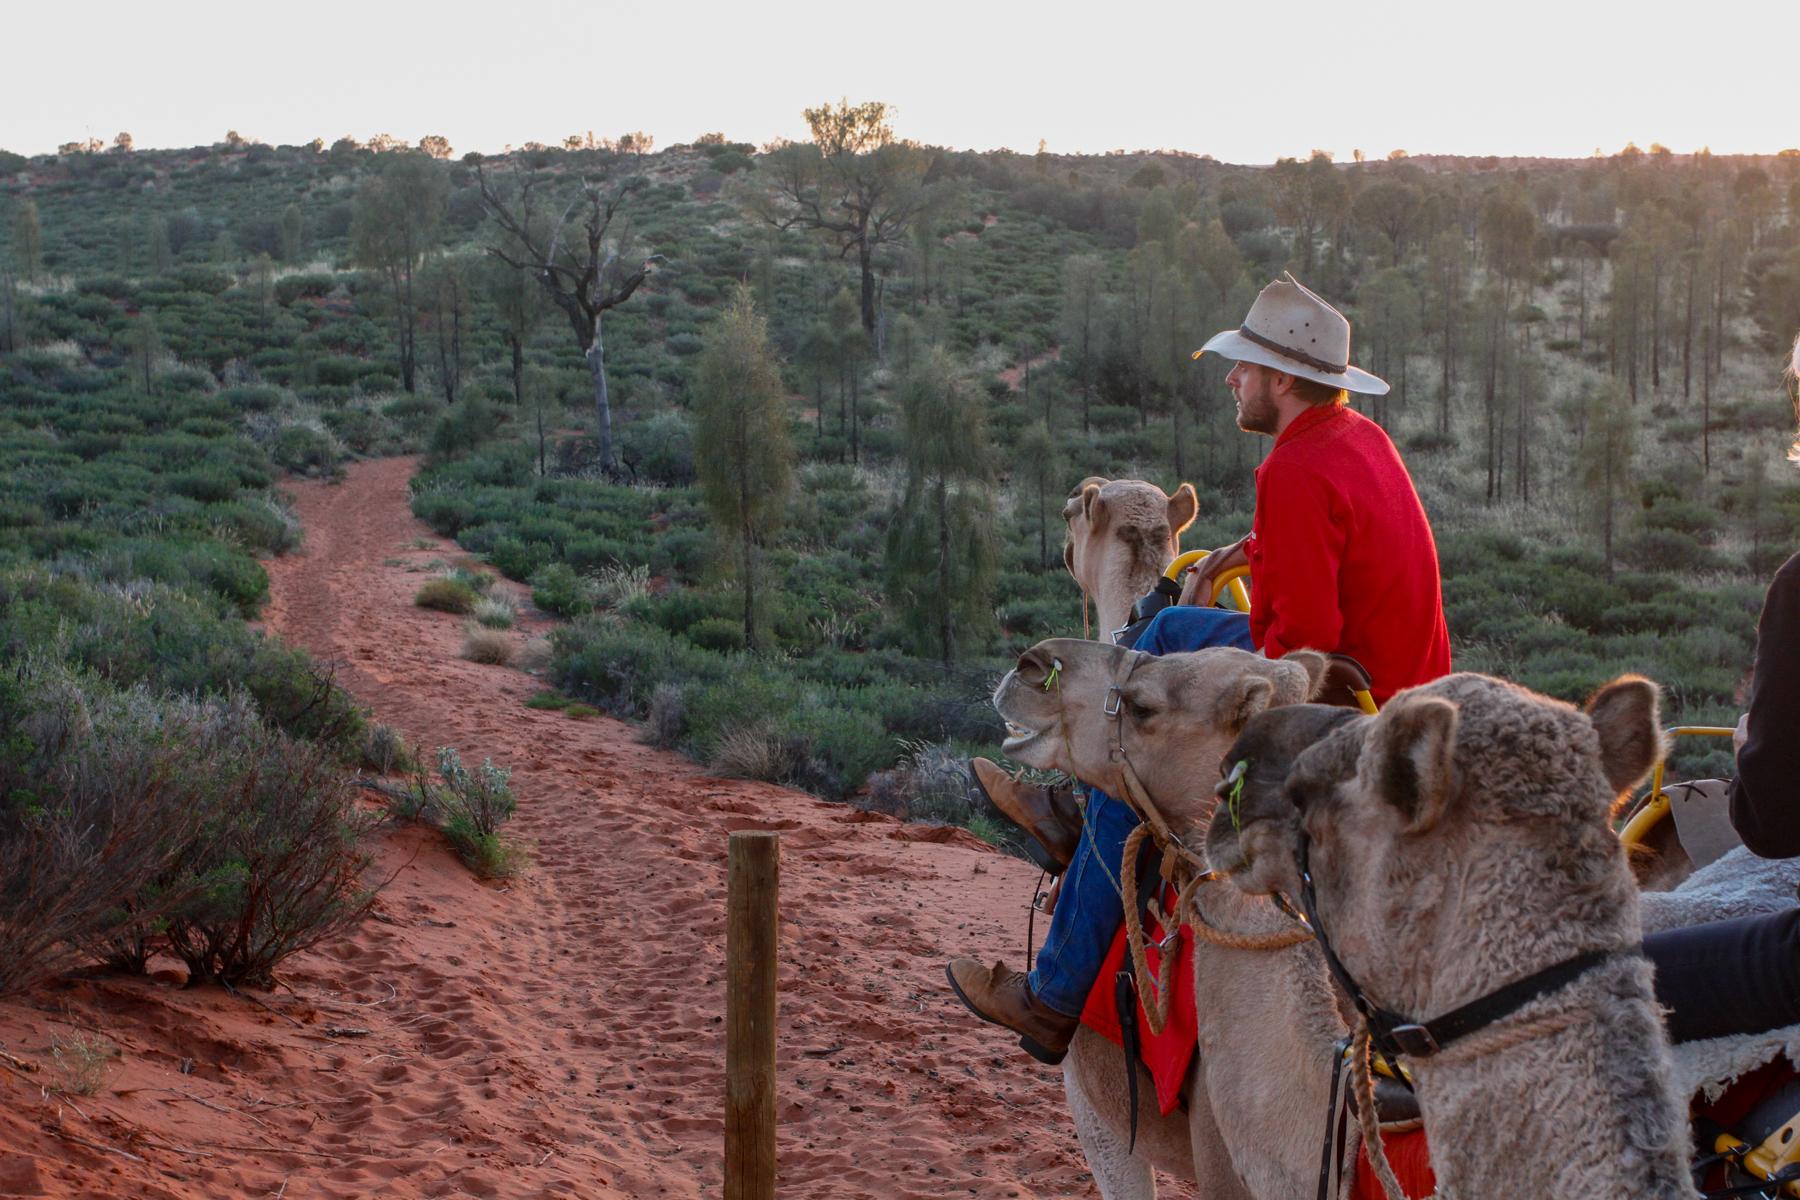 mg 1933 lr What to do in Uluru